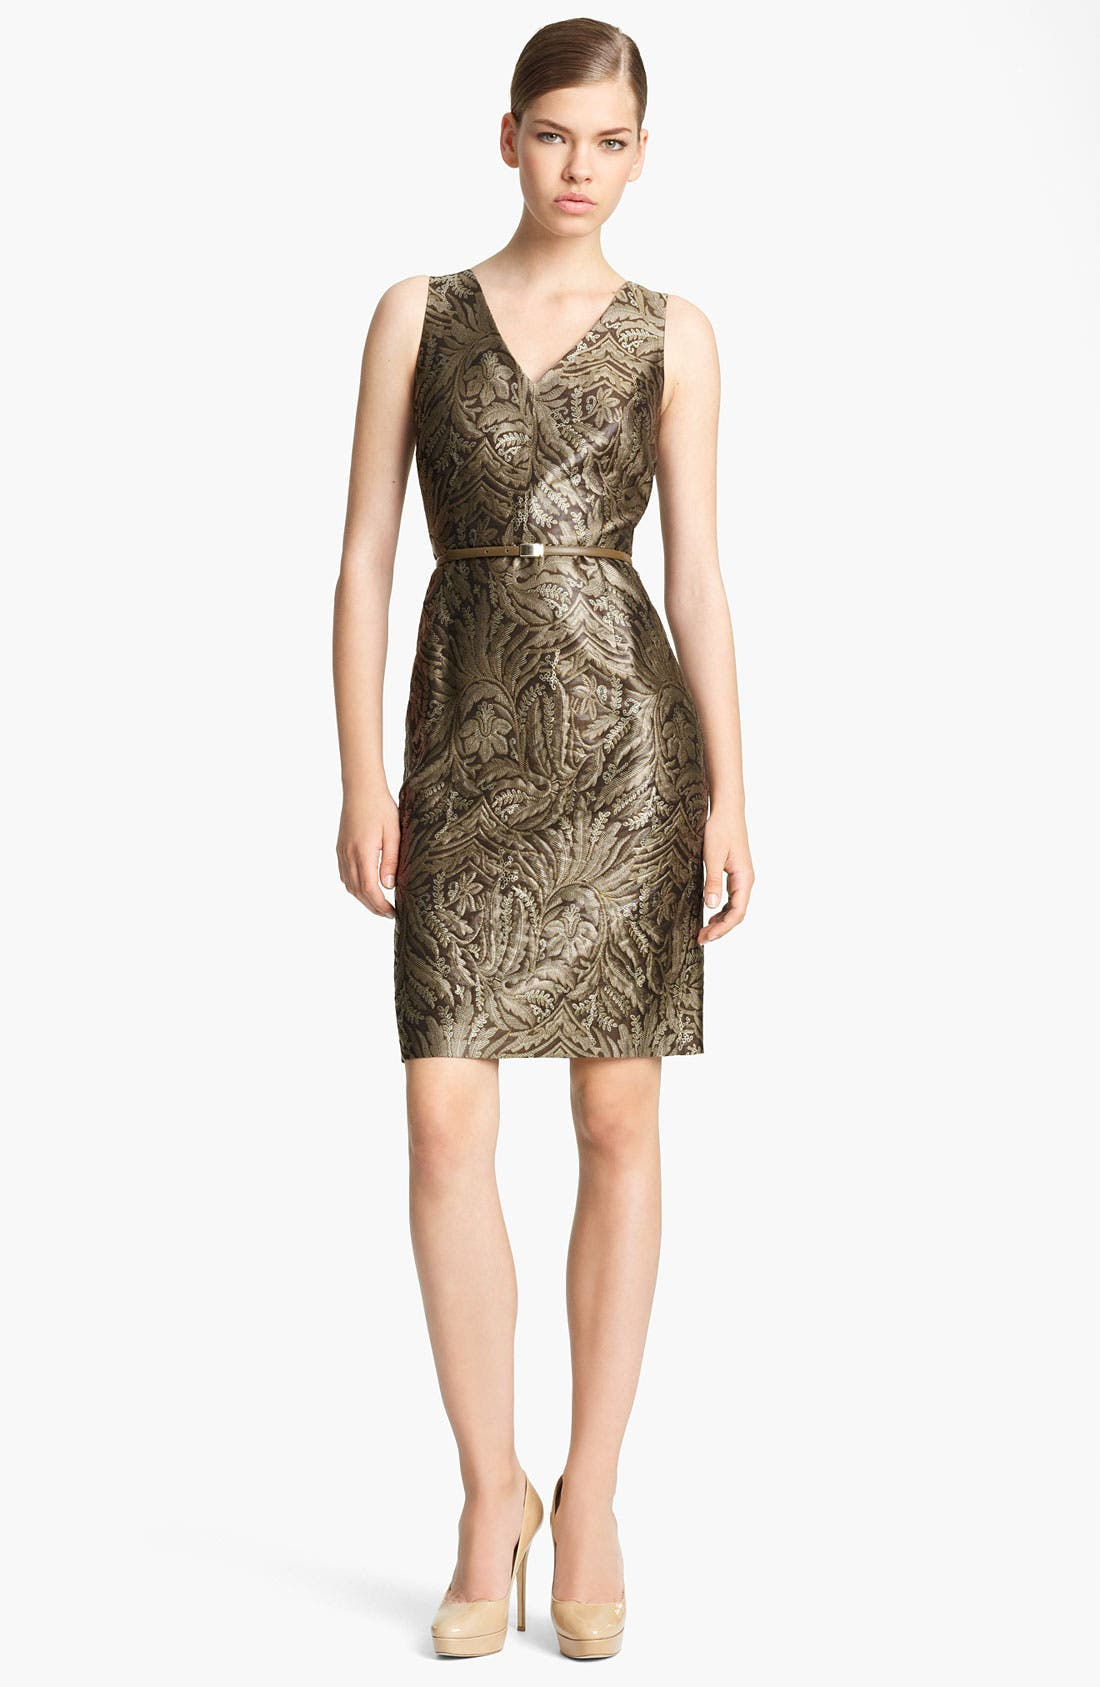 Main Image - Max Mara 'Cera' Belted Floral Brocade Dress